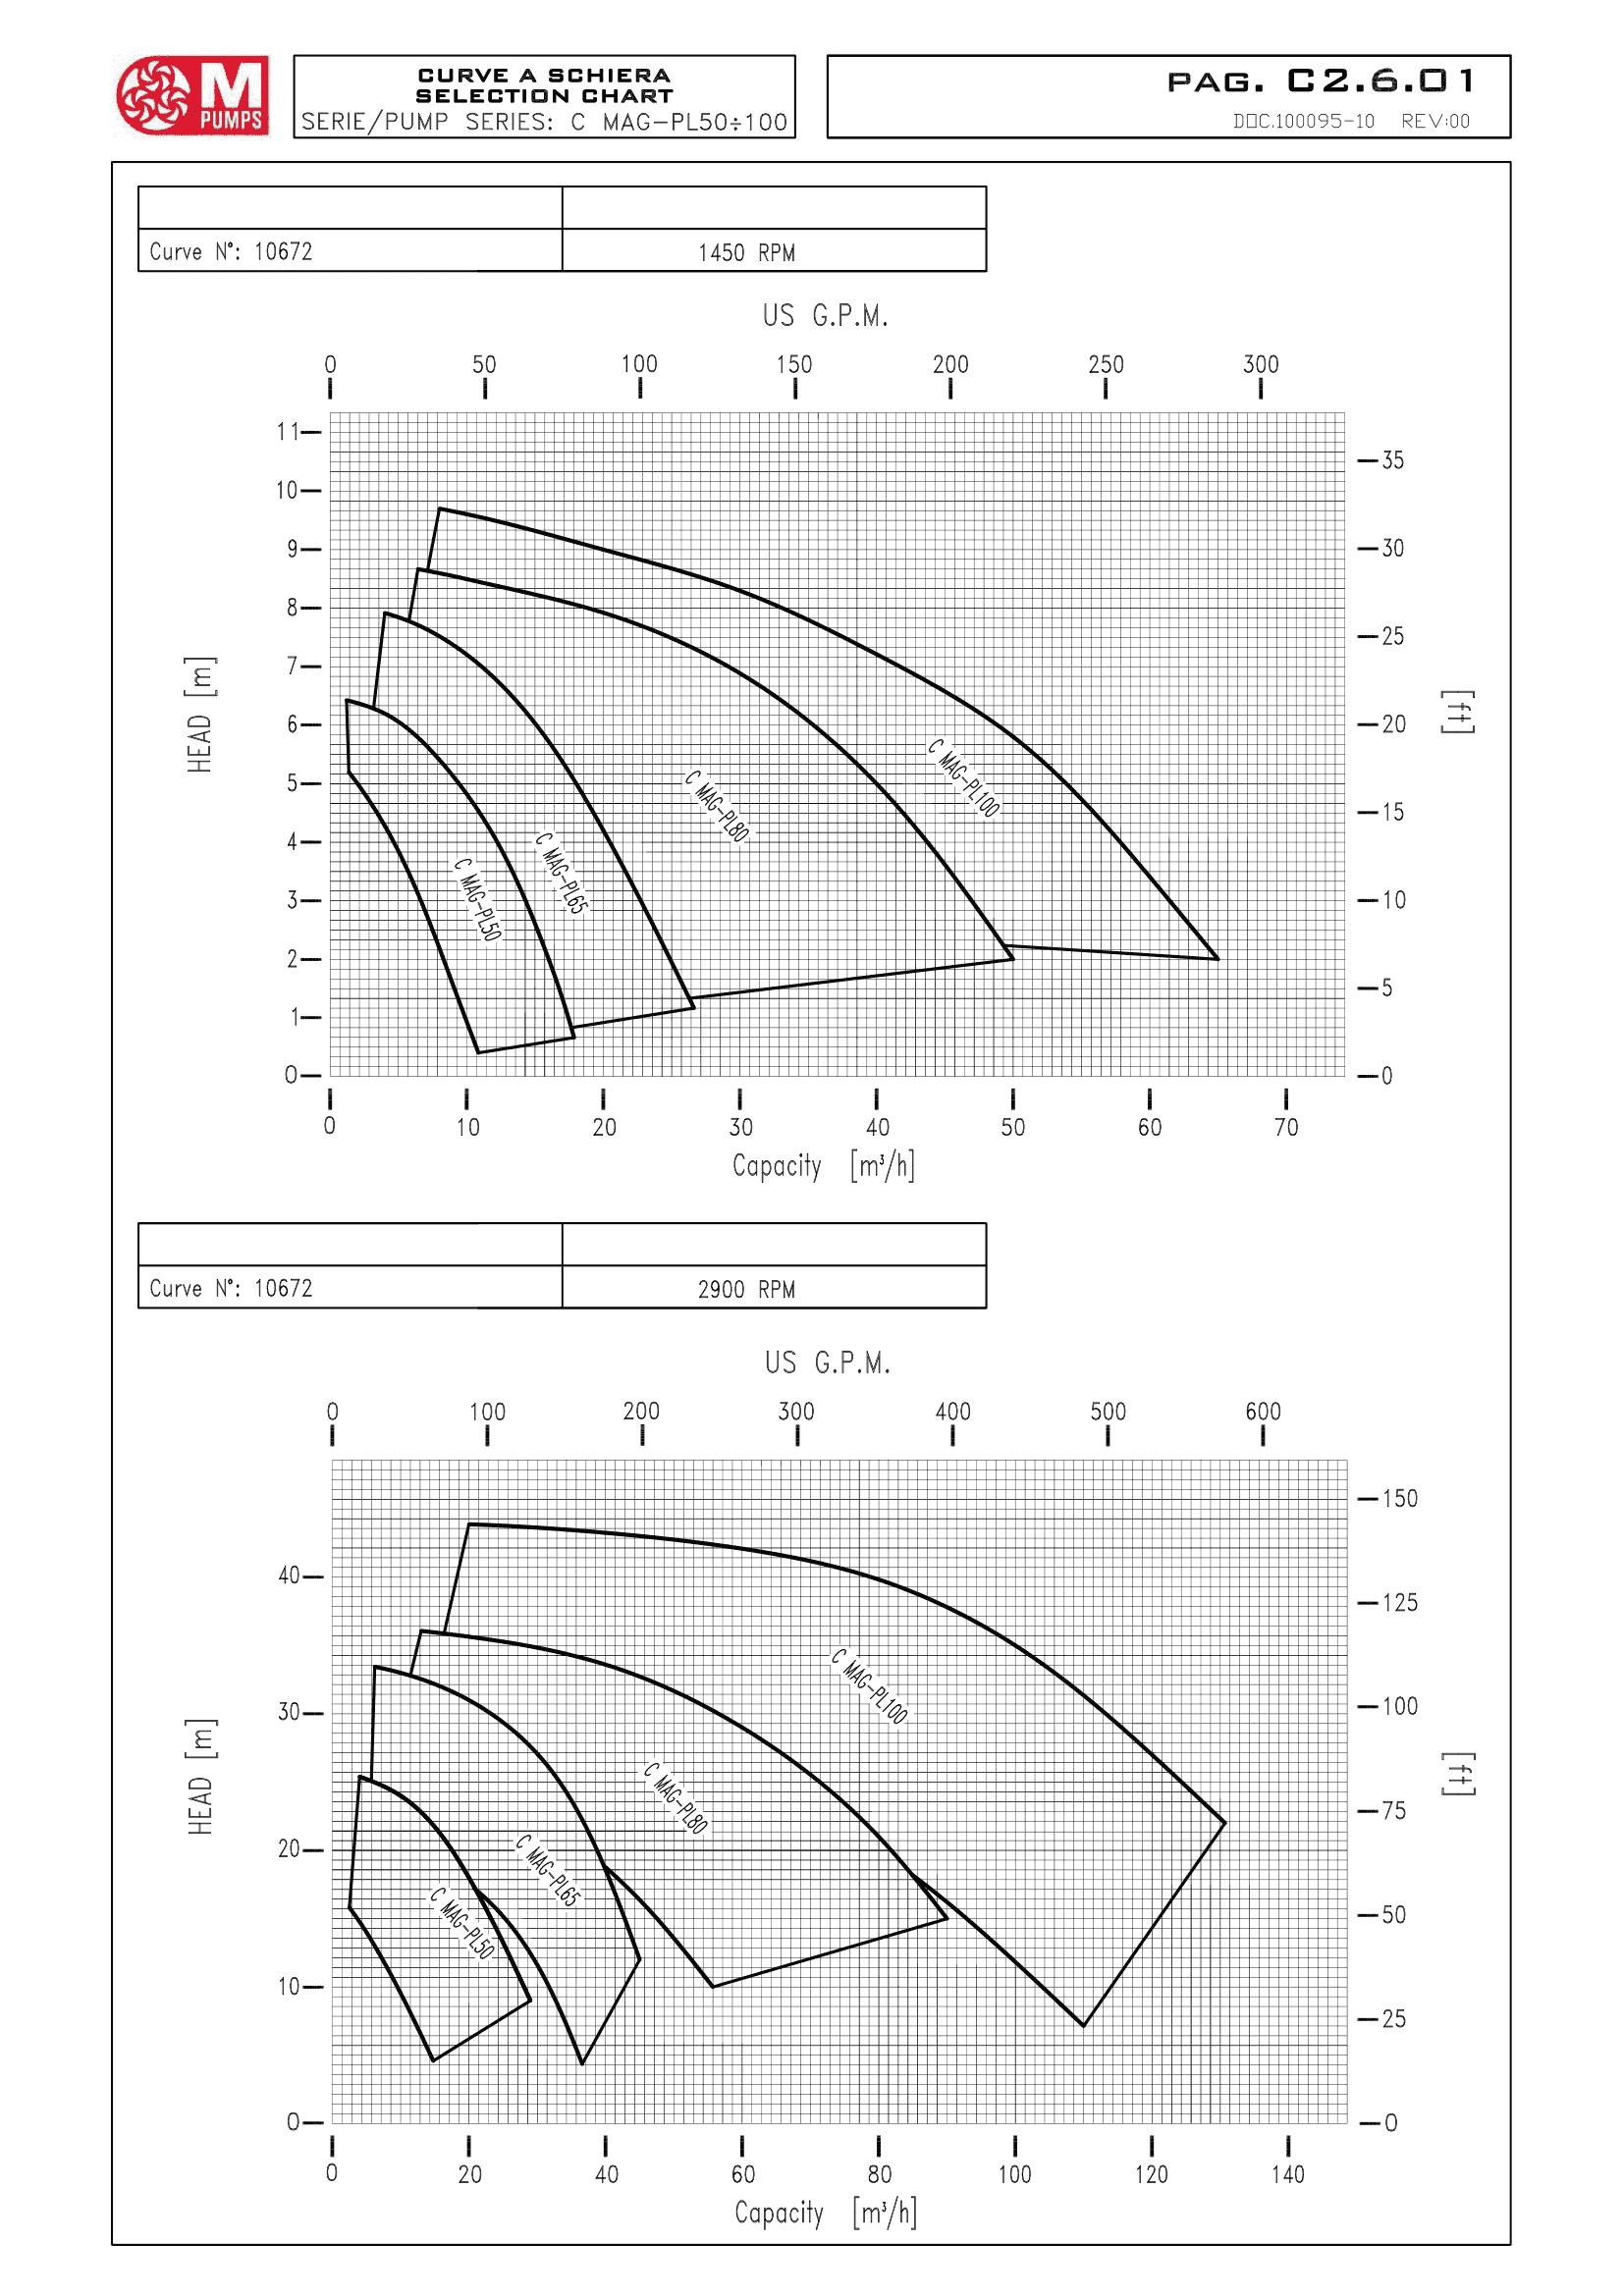 фото характеристики m pumps c mag-pl